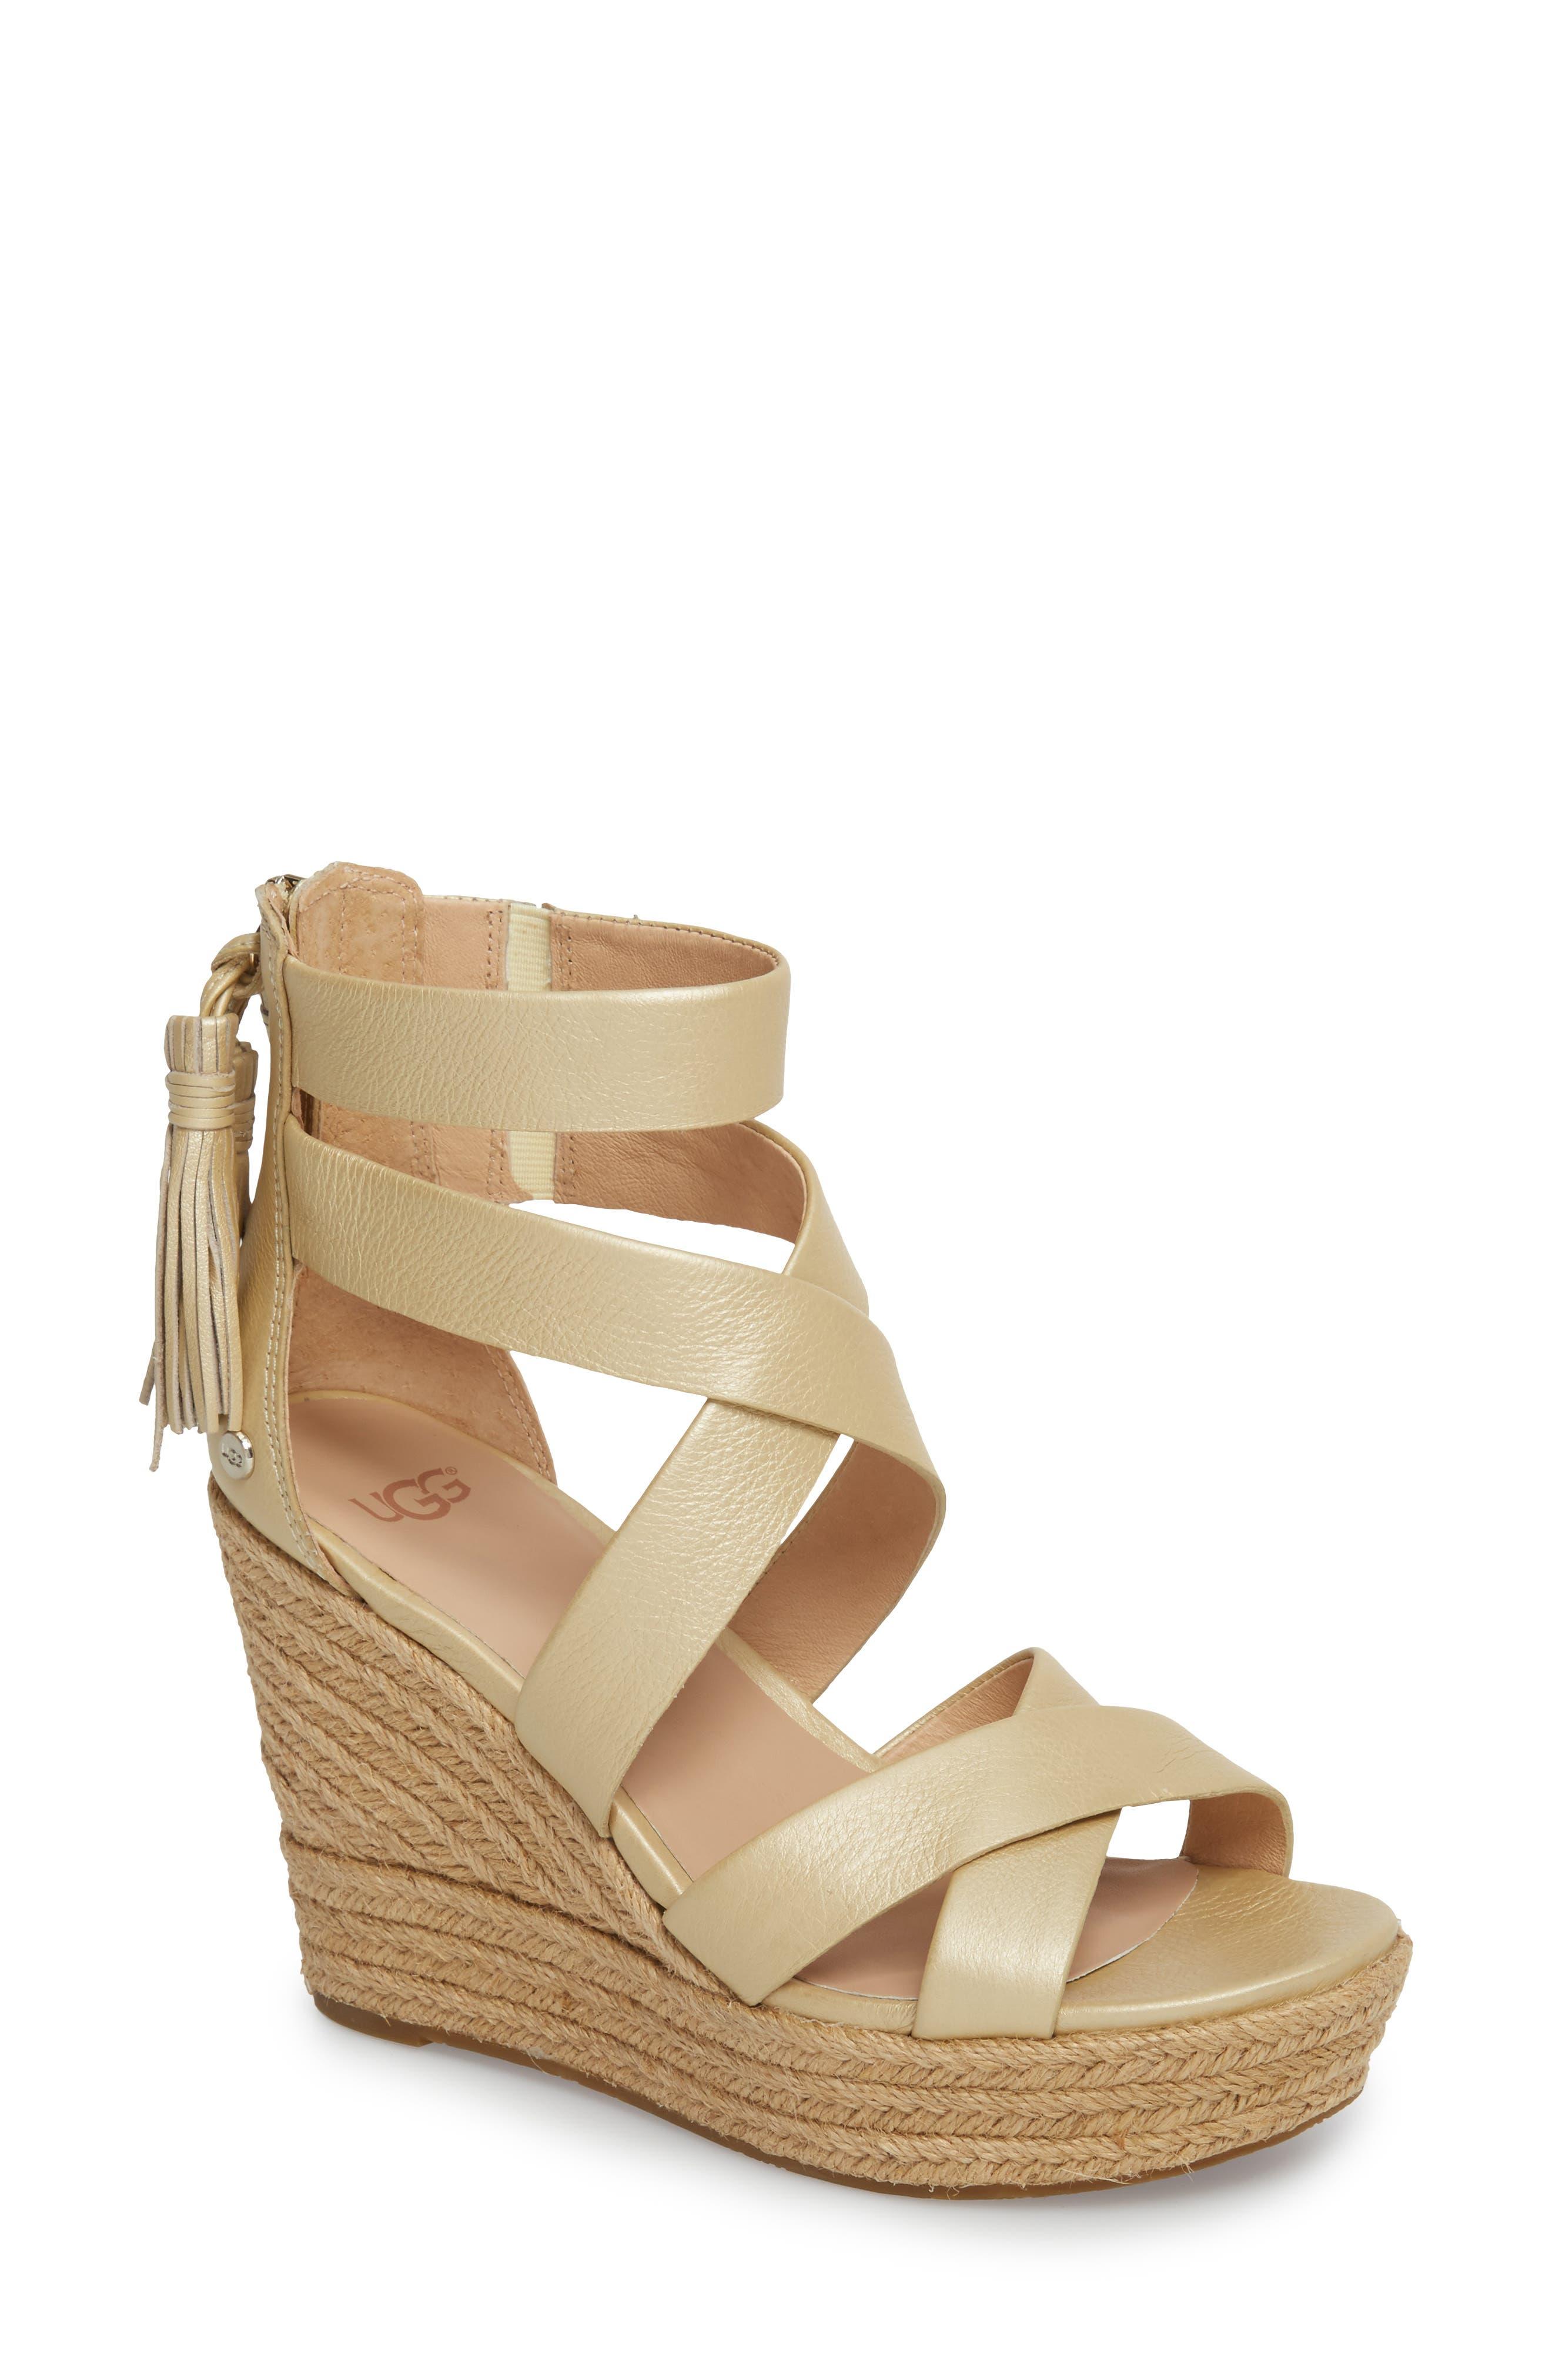 womens ugg boots wedge heel